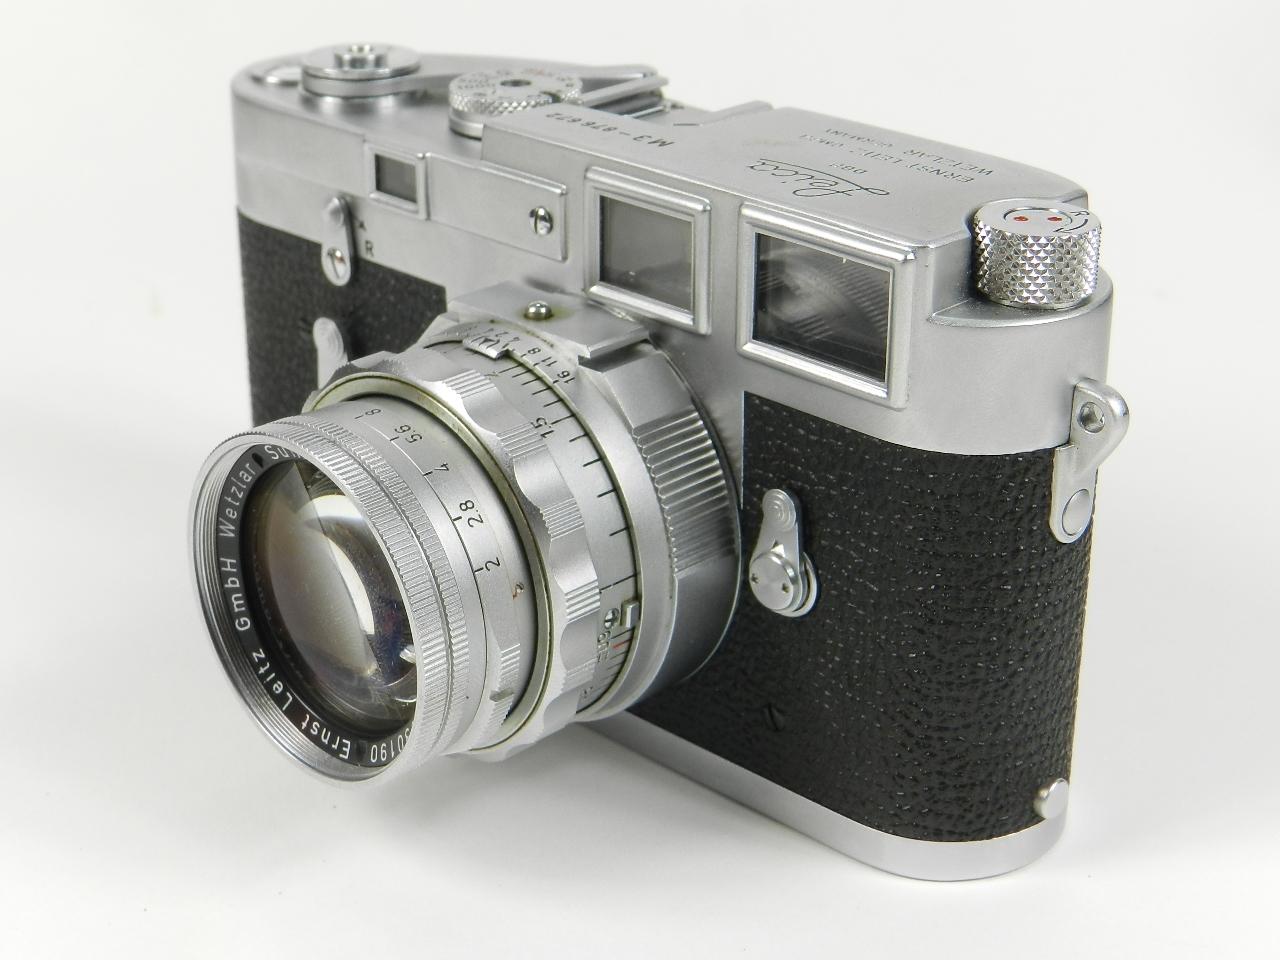 Imagen LEICA M3 AÑO 1957 + 4 OBJETIVOS + EXTRAS 28531